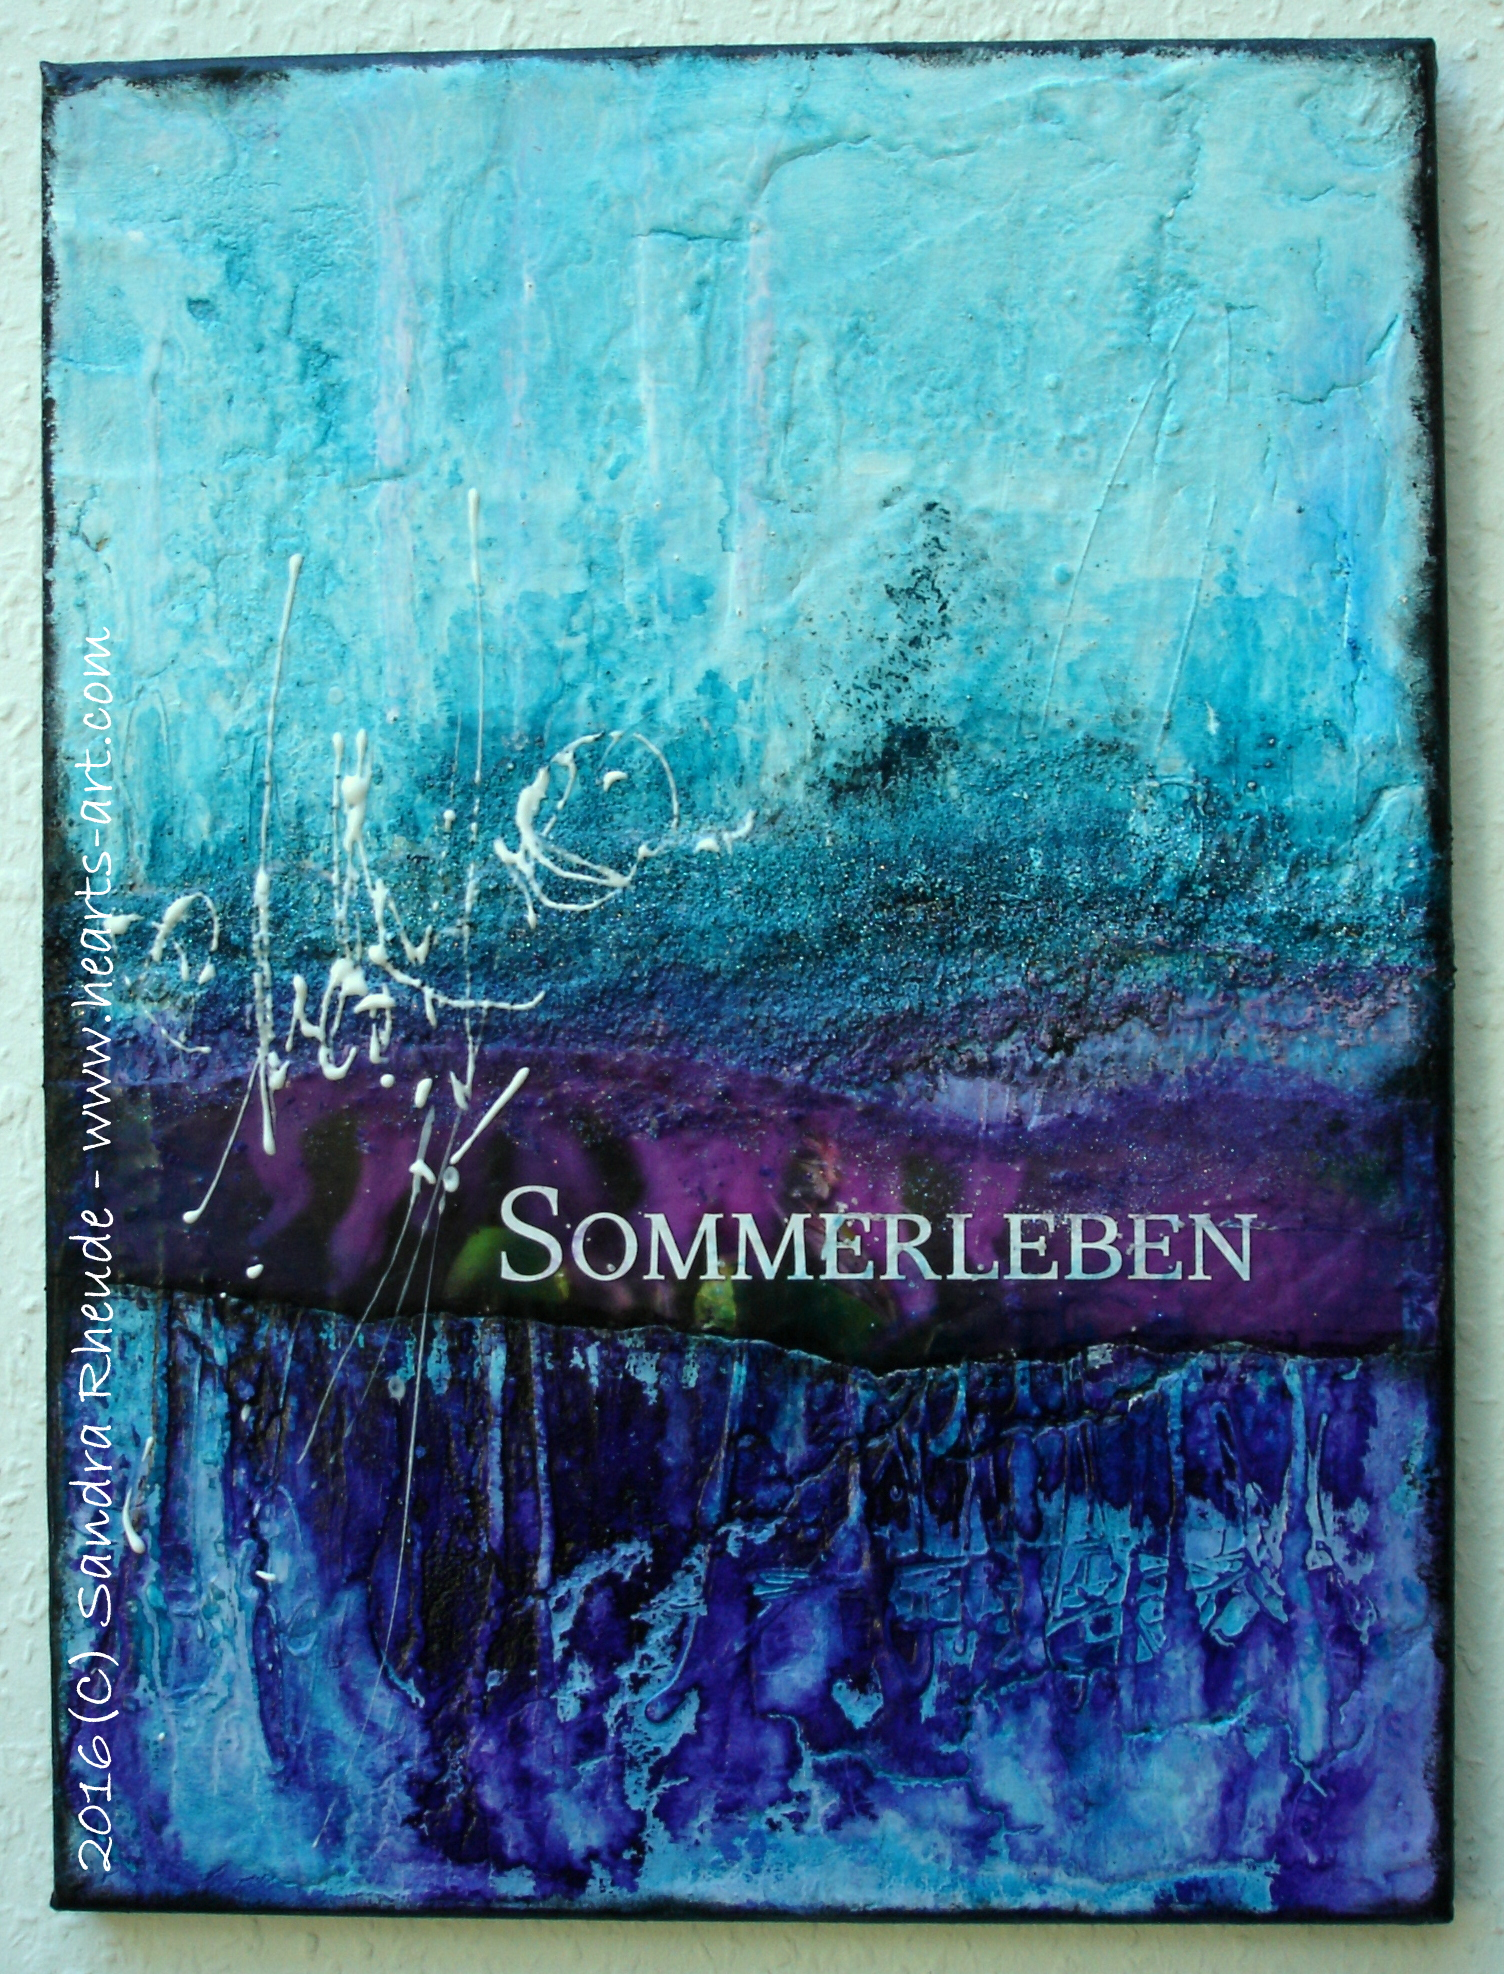 'Sommerleben' - 2016/36 - Acryl/MixedMedia auf Leinwand - 30 x 40 cm - € 190